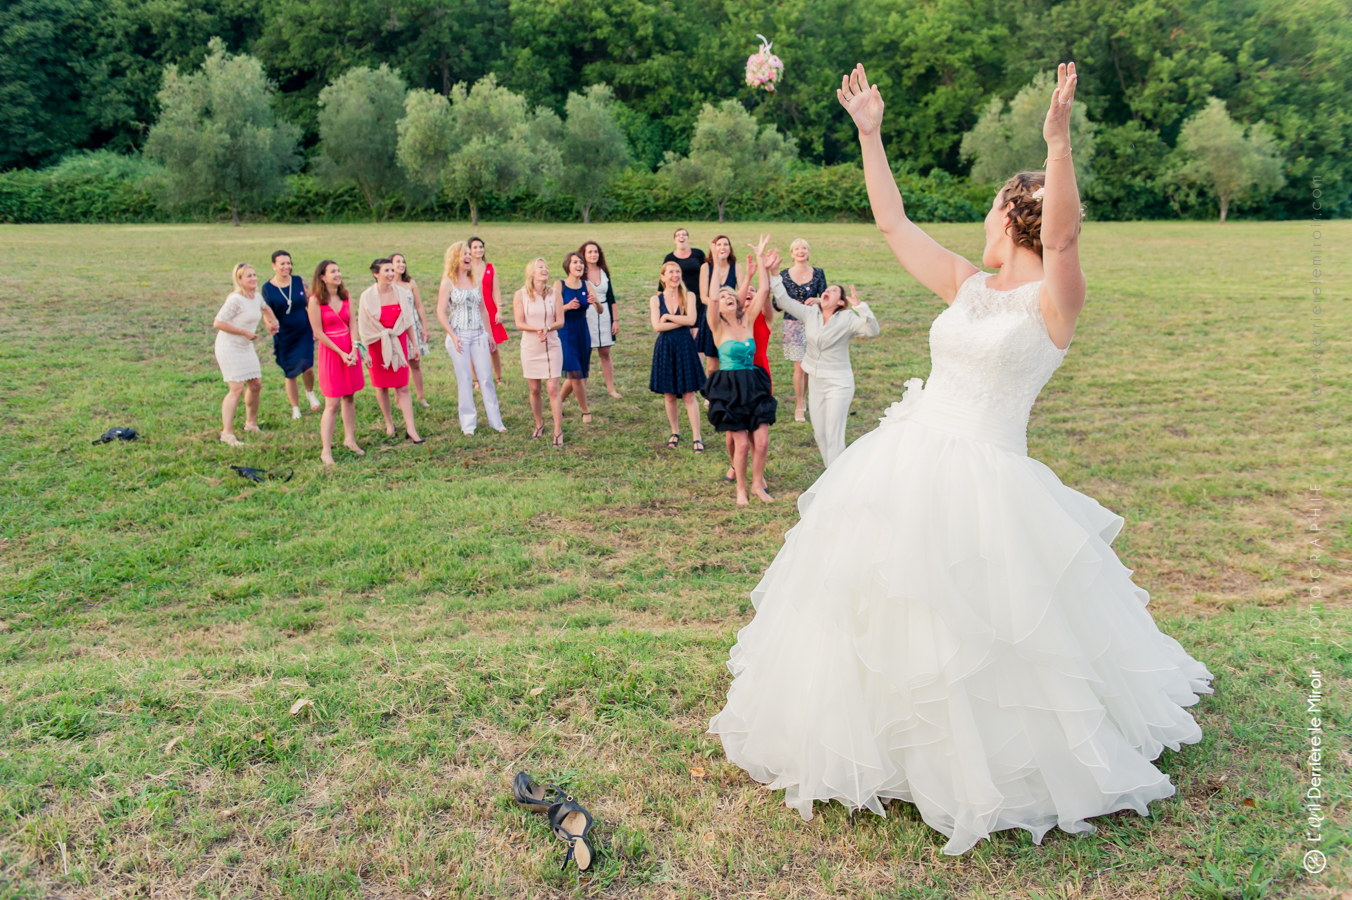 mariage-cj-vaugrenier-loeilderrierelemiroir-066